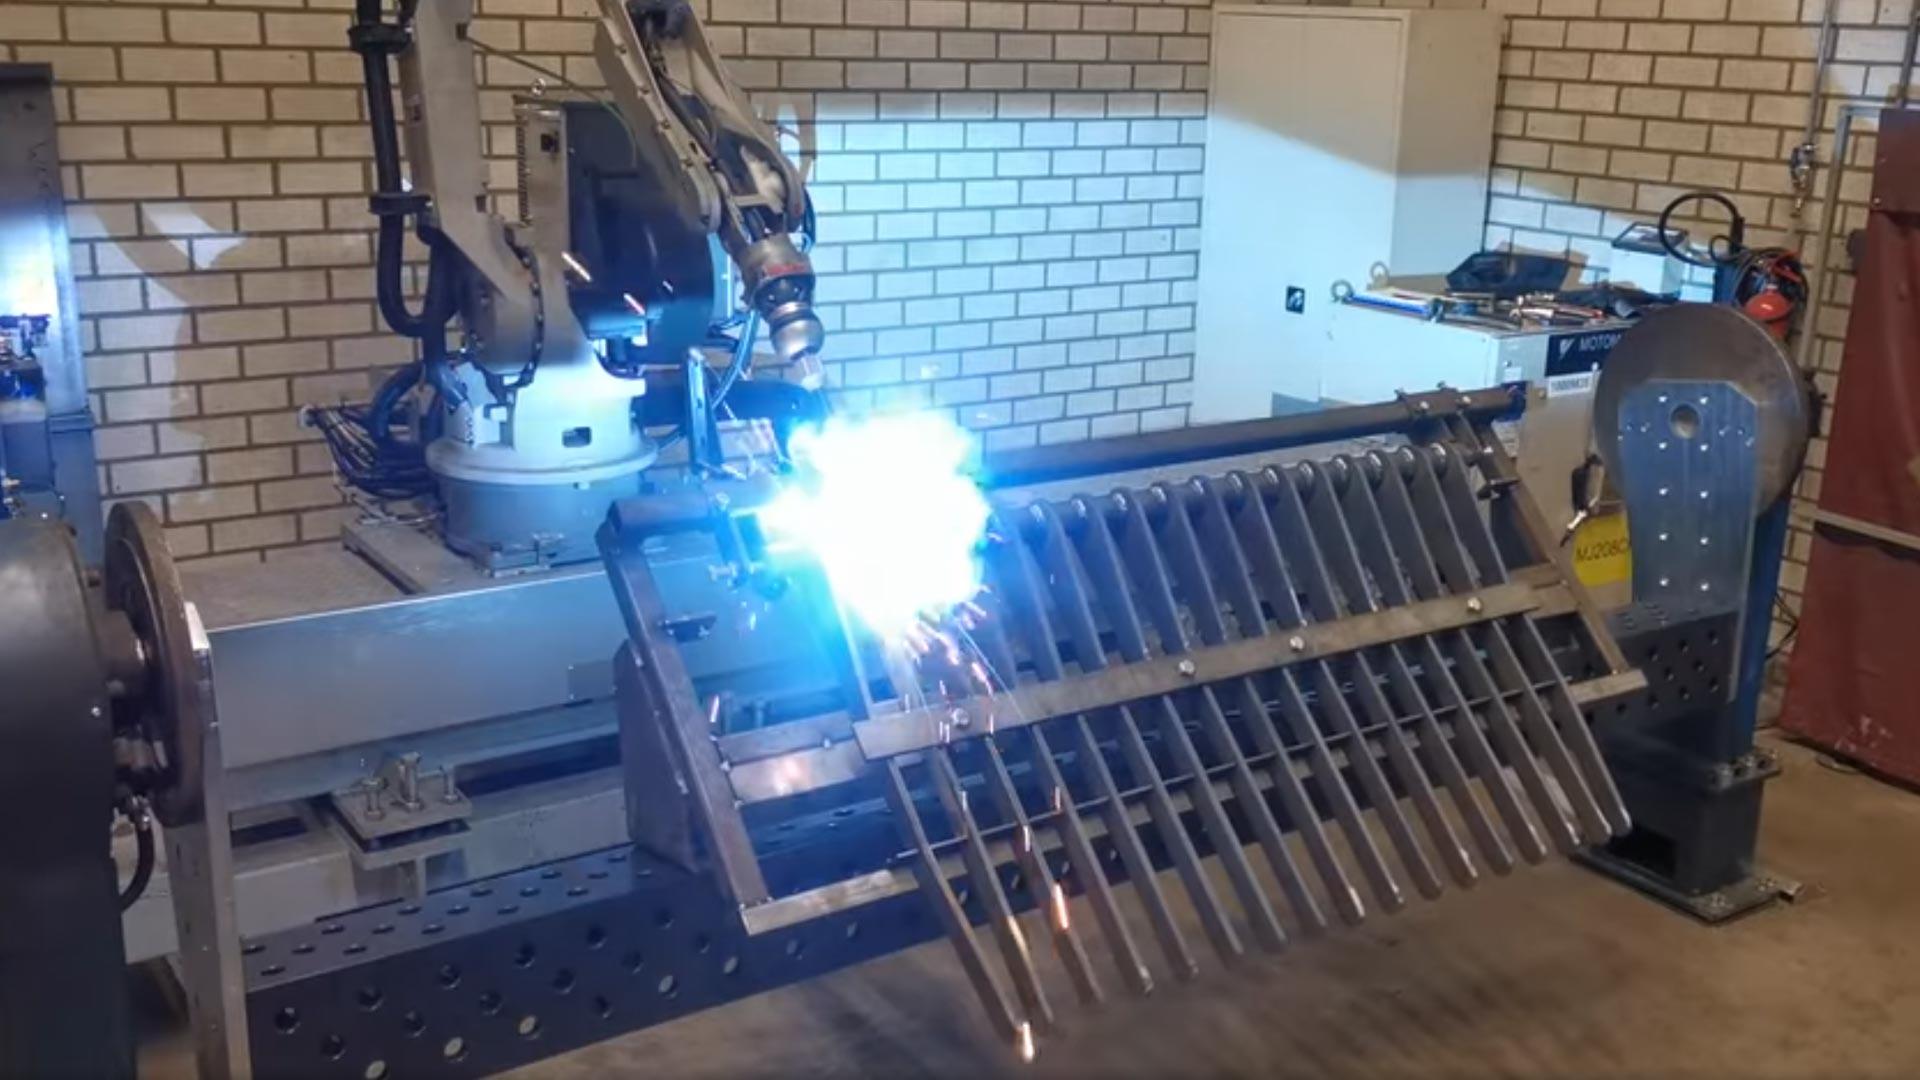 Lasrobot Elco Machinebouw